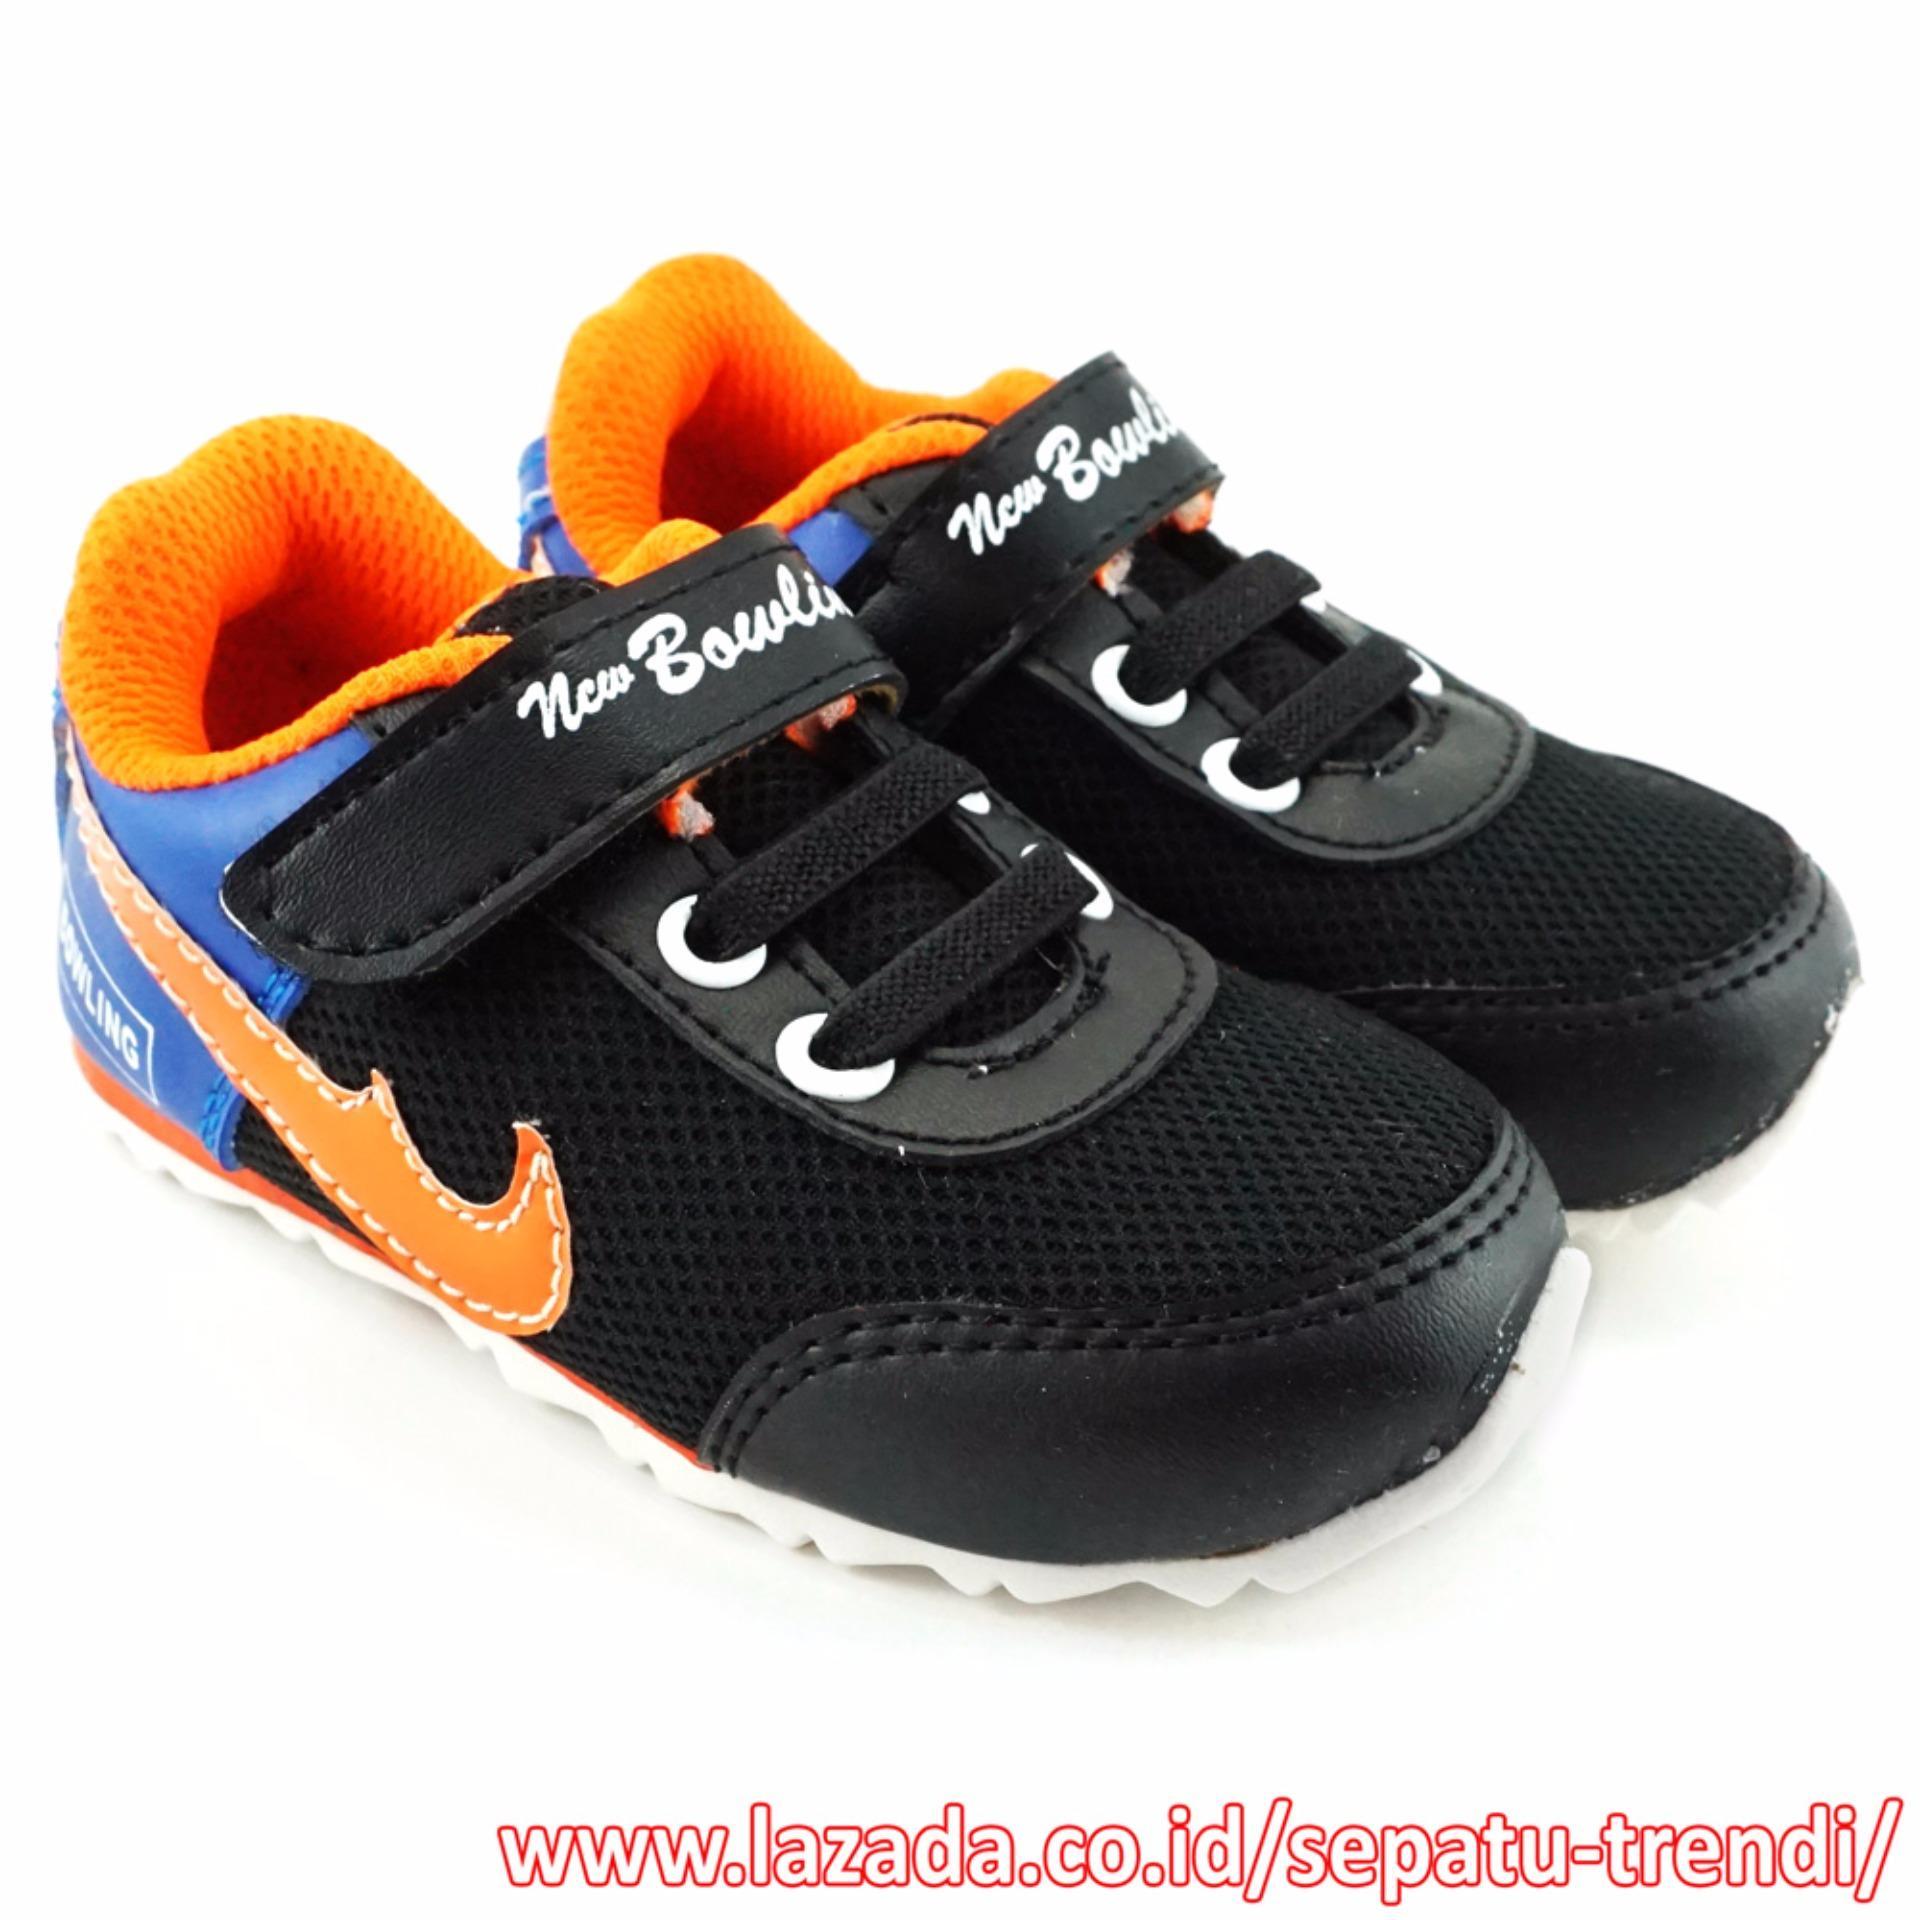 Jual Trendishoes Sepatu Anak Bayi Sporty New Bowling Biru Trendishoes Murah